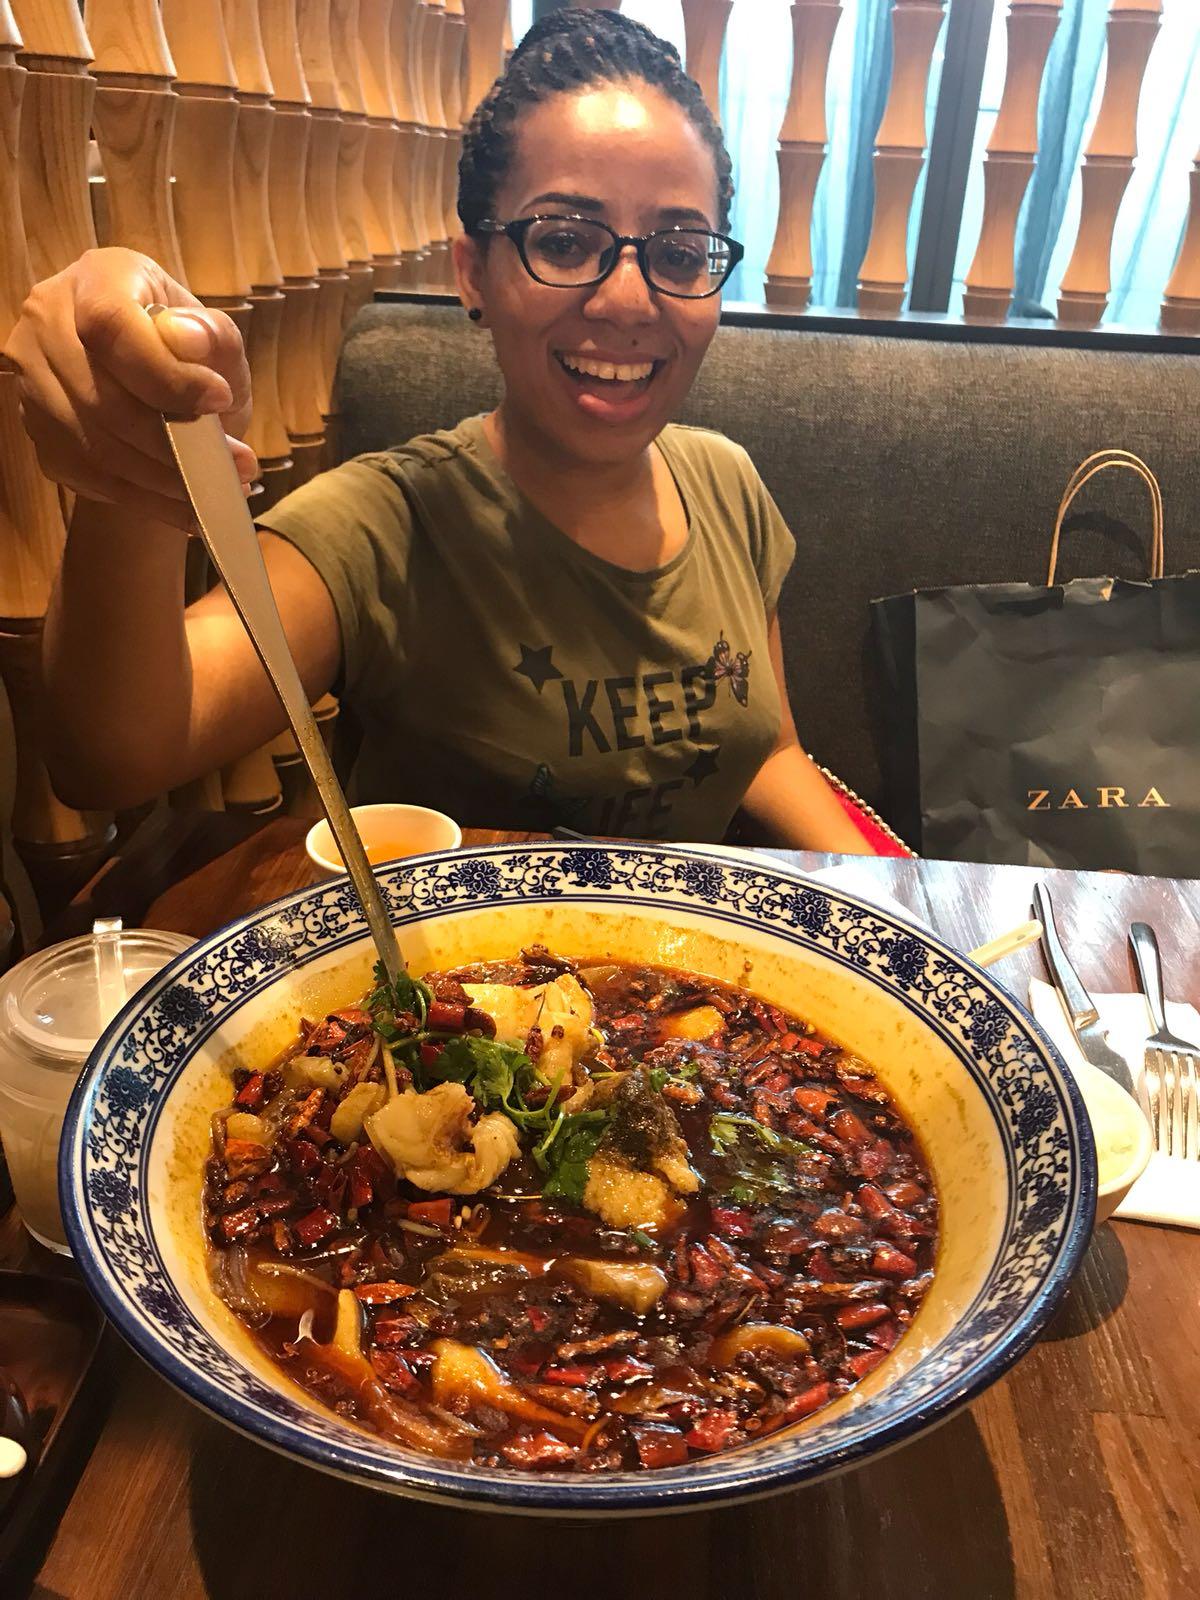 Exploring food at Taipei